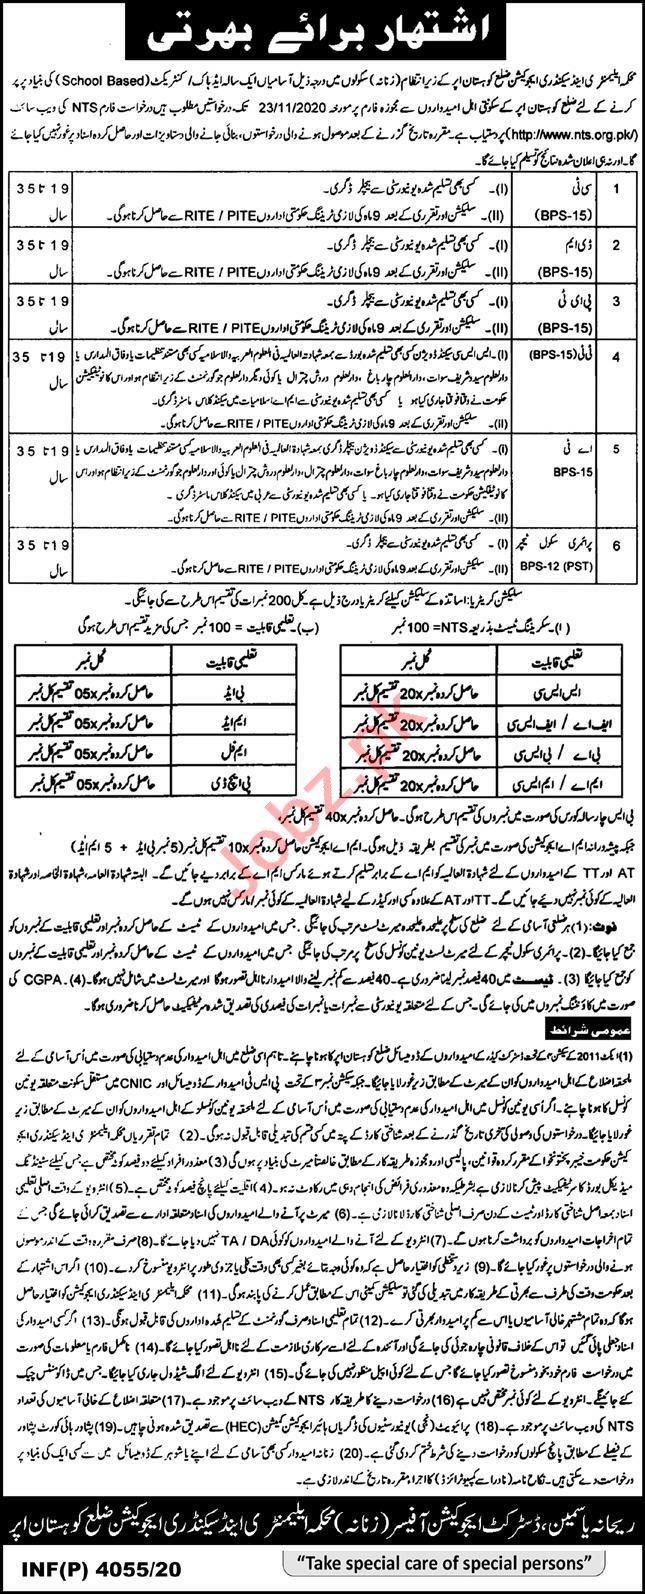 Elementary & Secondary Education ESED Kohistan Jobs 2020